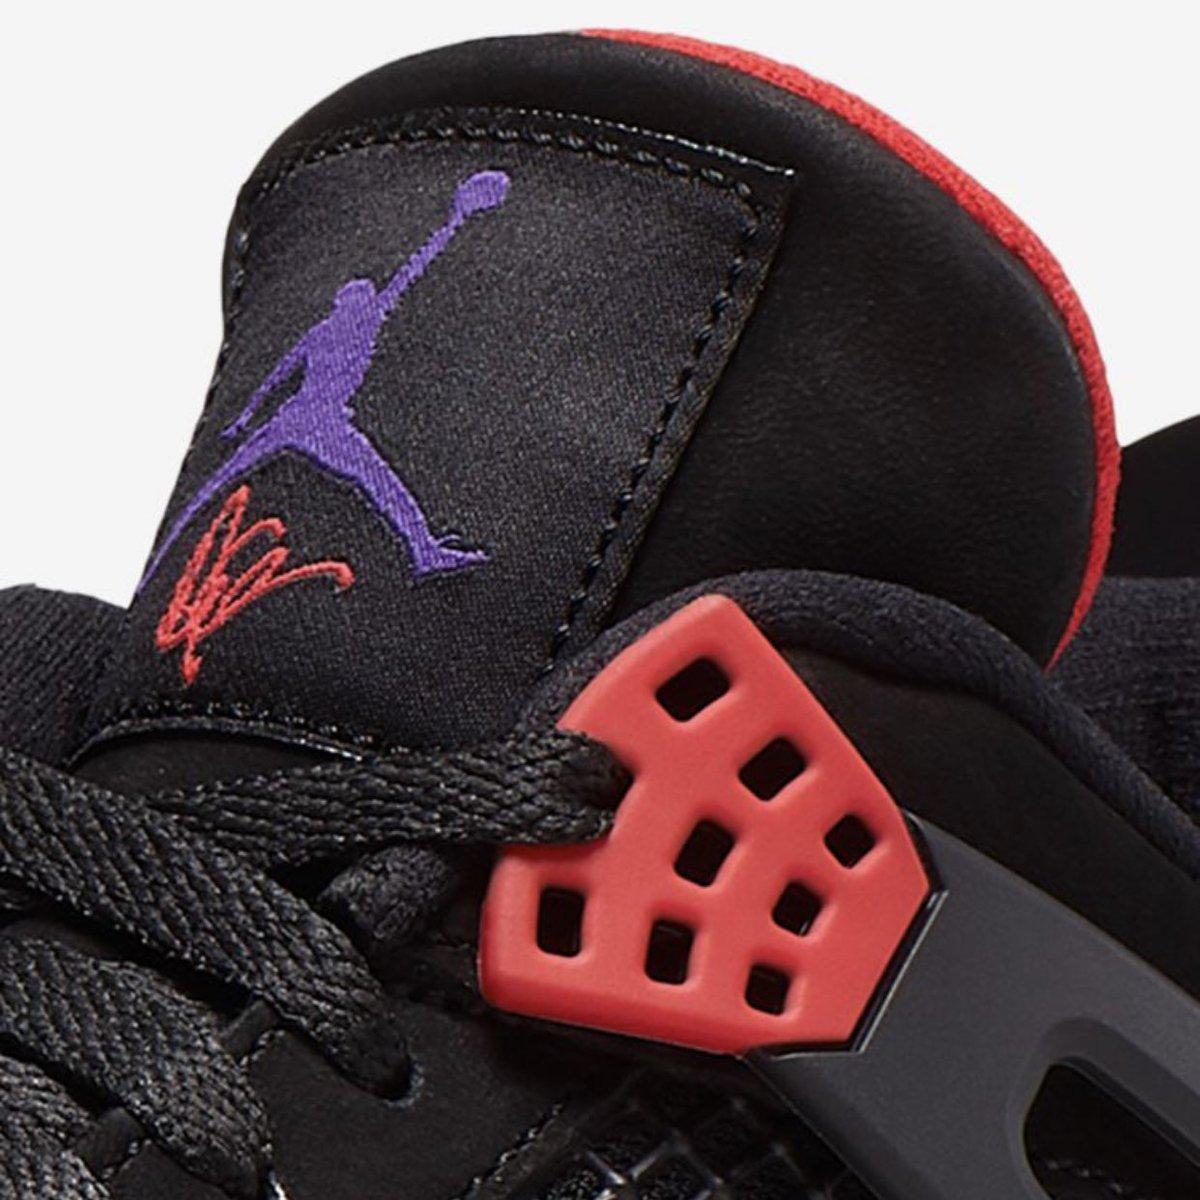 best website 22434 9f1d8 Complex Sneakers on Twitter: